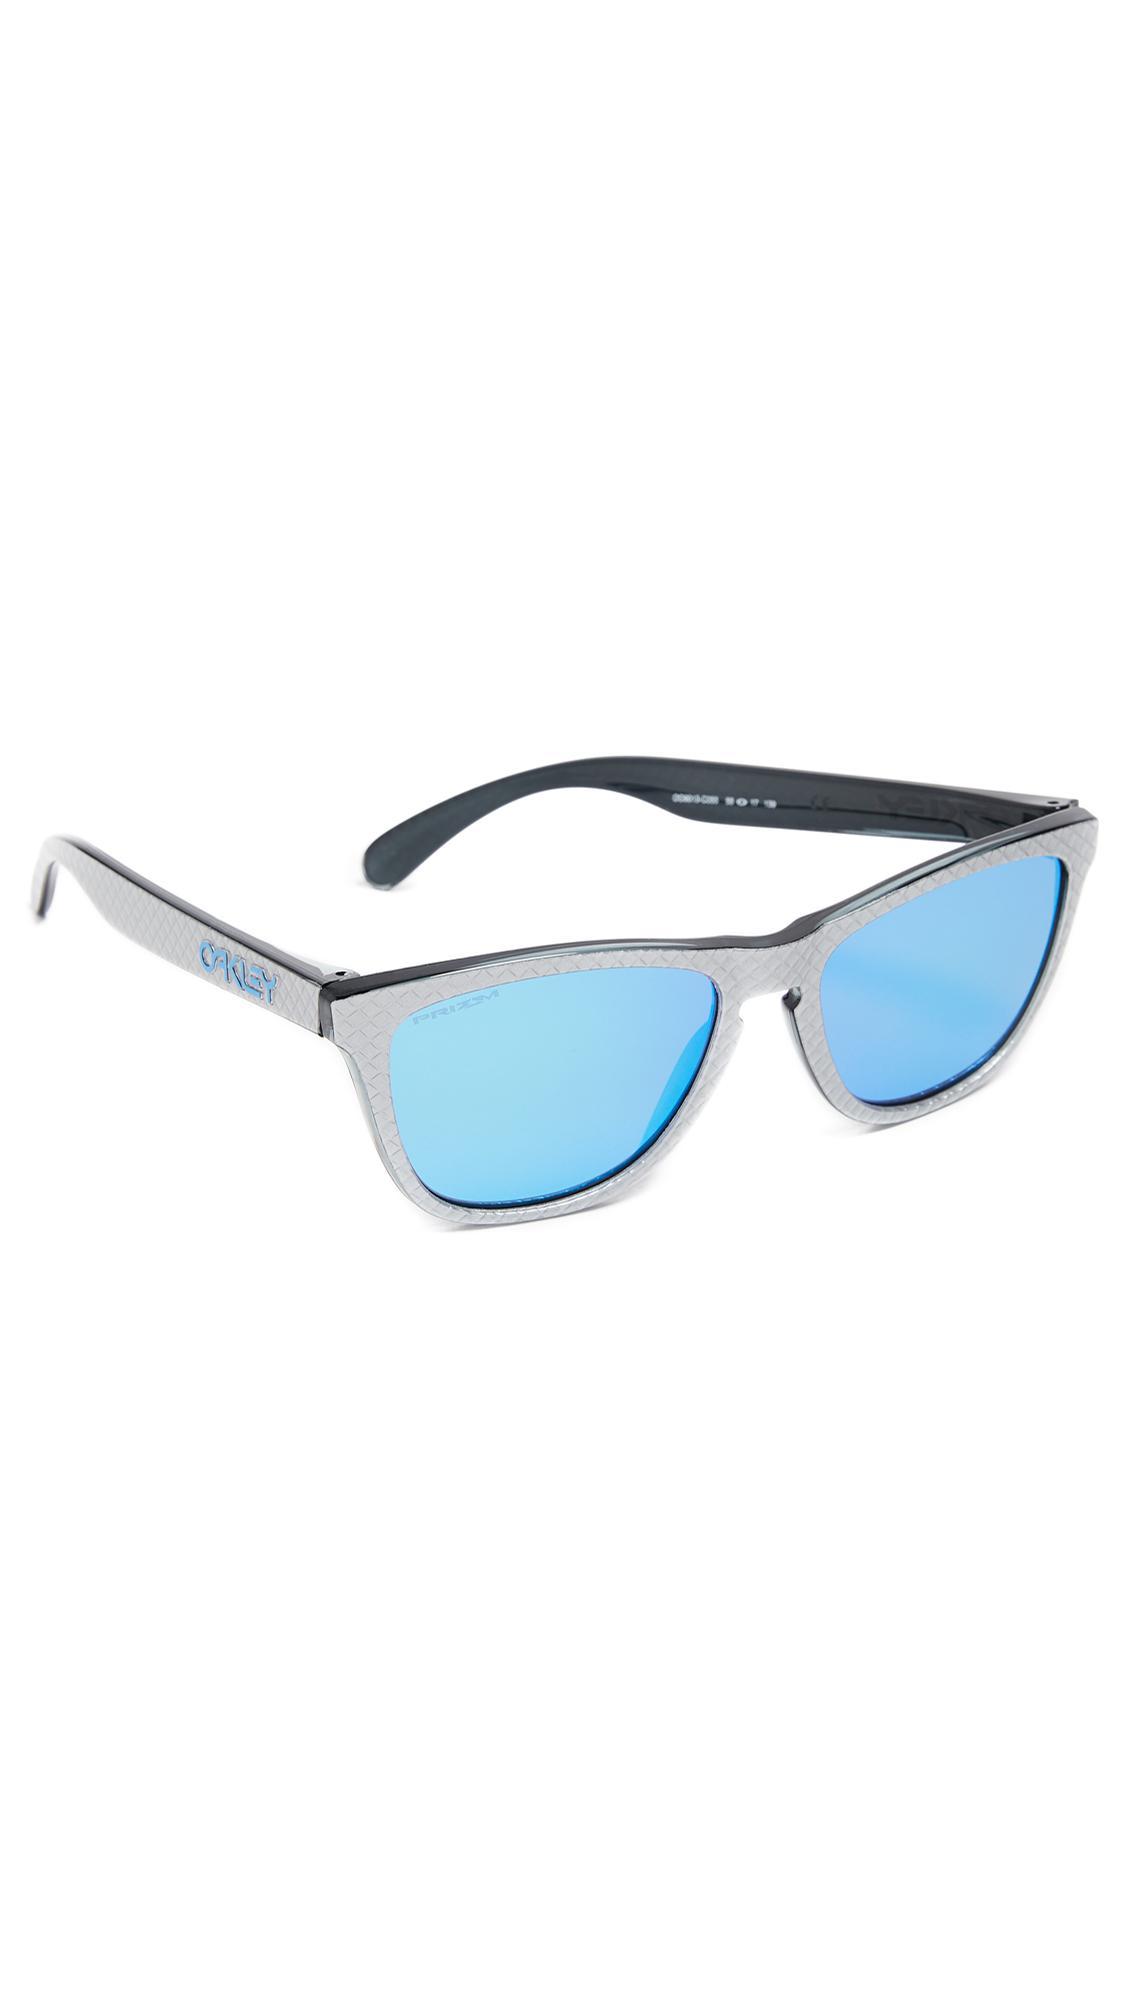 48eefab1fd Lyst - Oakley Frogskins Prizm Checkbox Sunglasses in Blue for Men